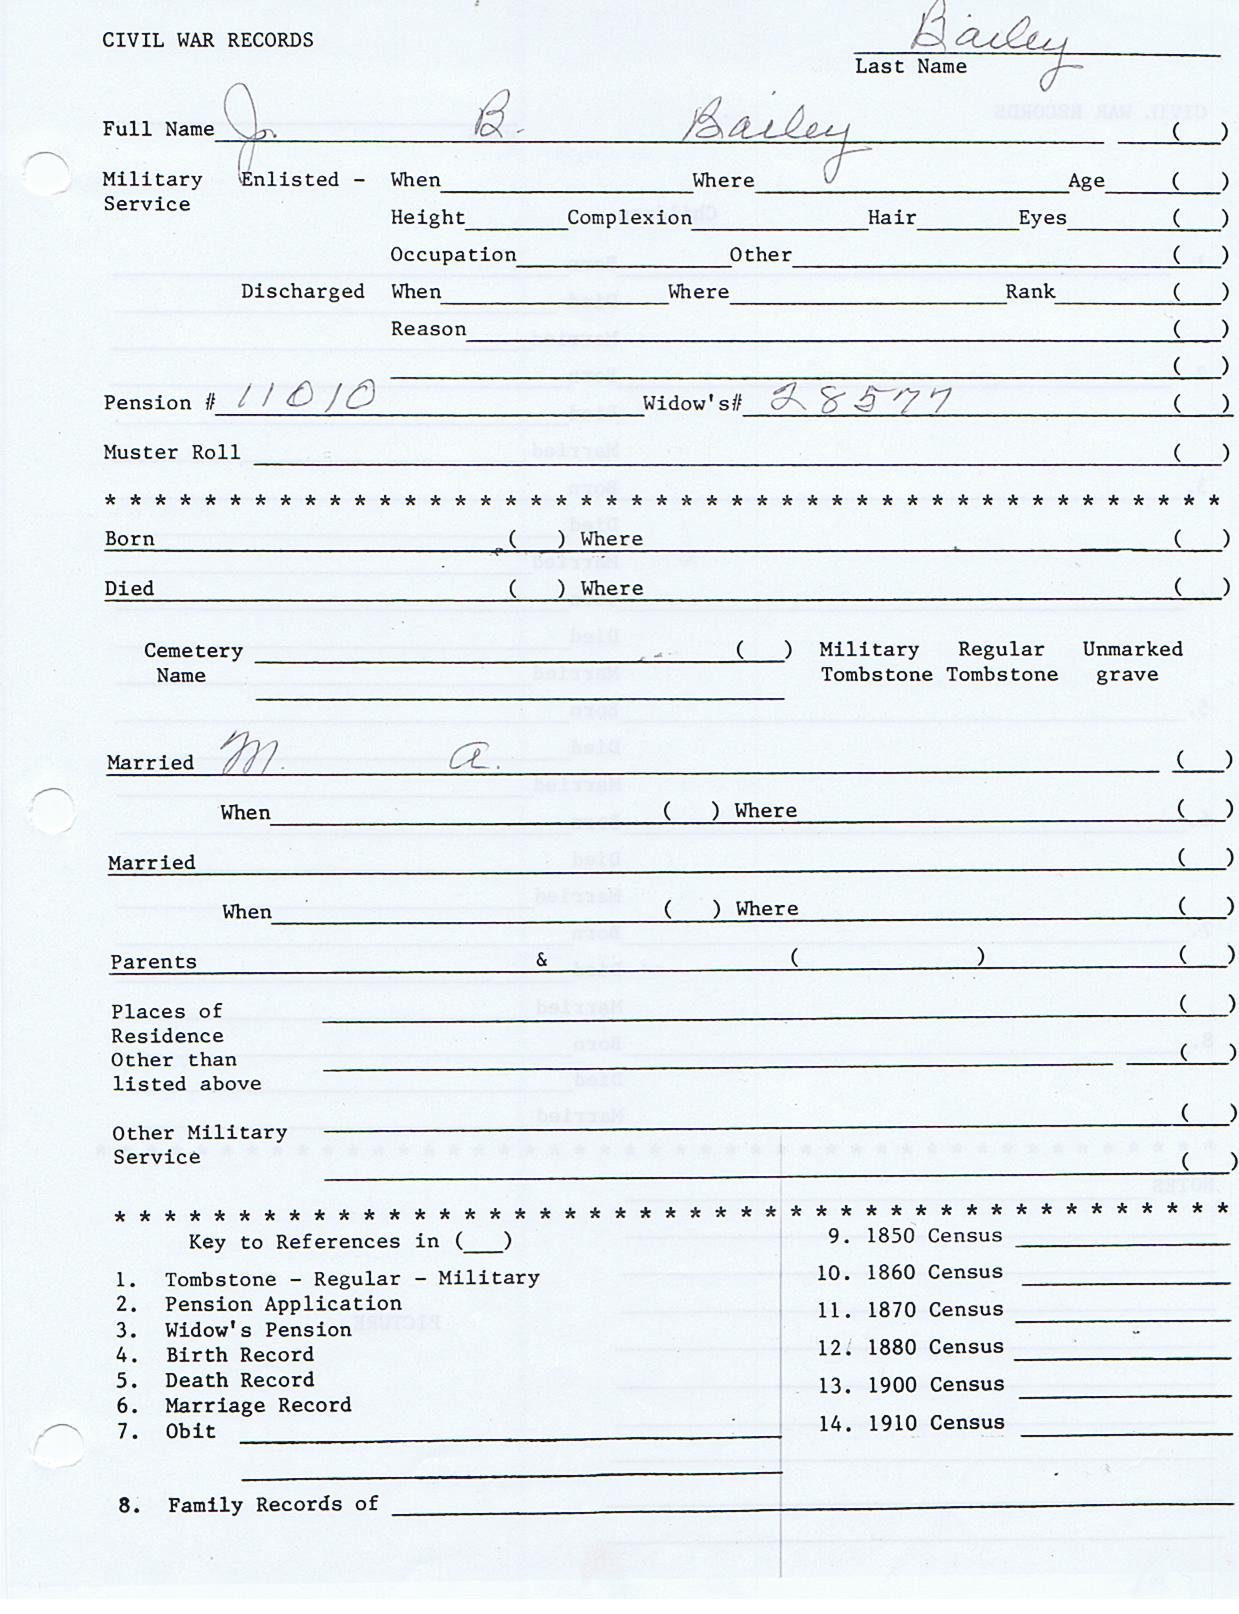 bailey-kaufman_civil_war_records-3489